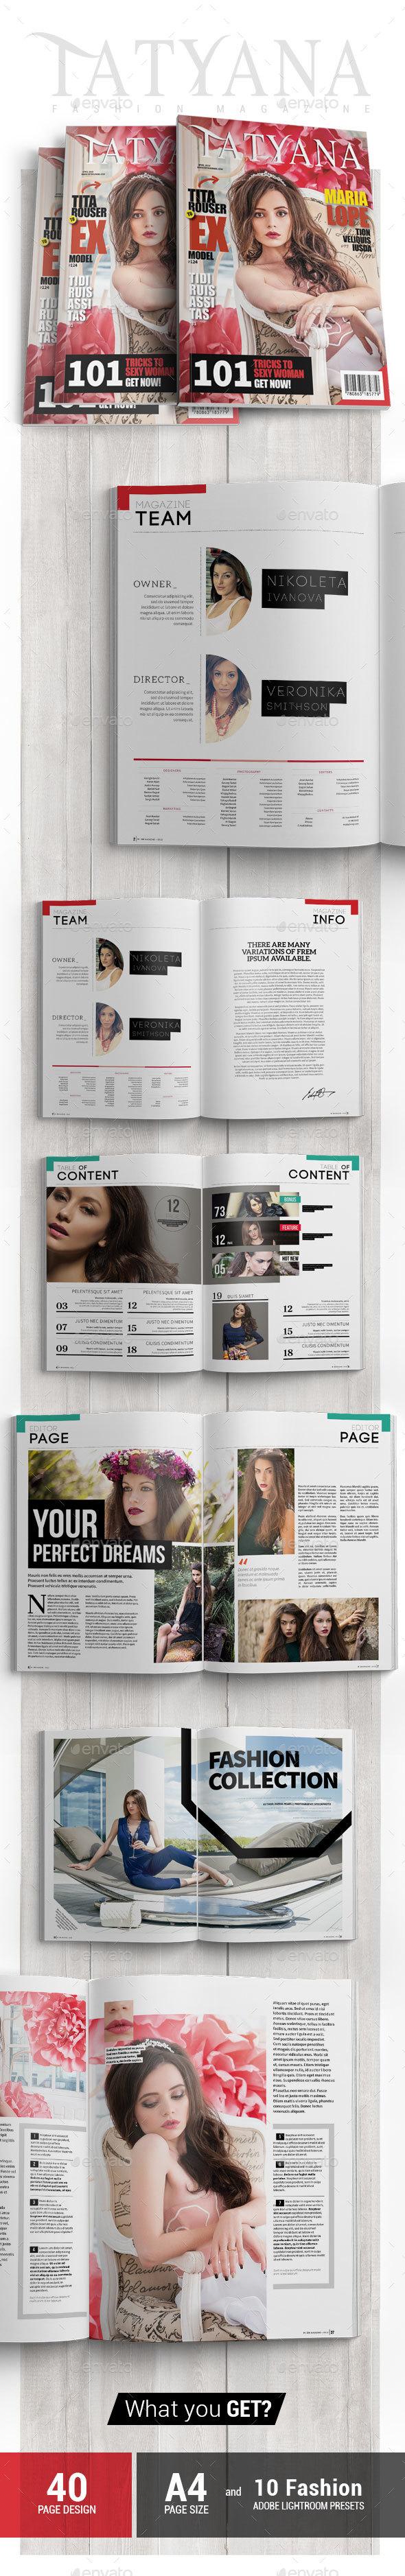 Tatyana - Fashion Magazine Issue 5 - Magazines Print Templates